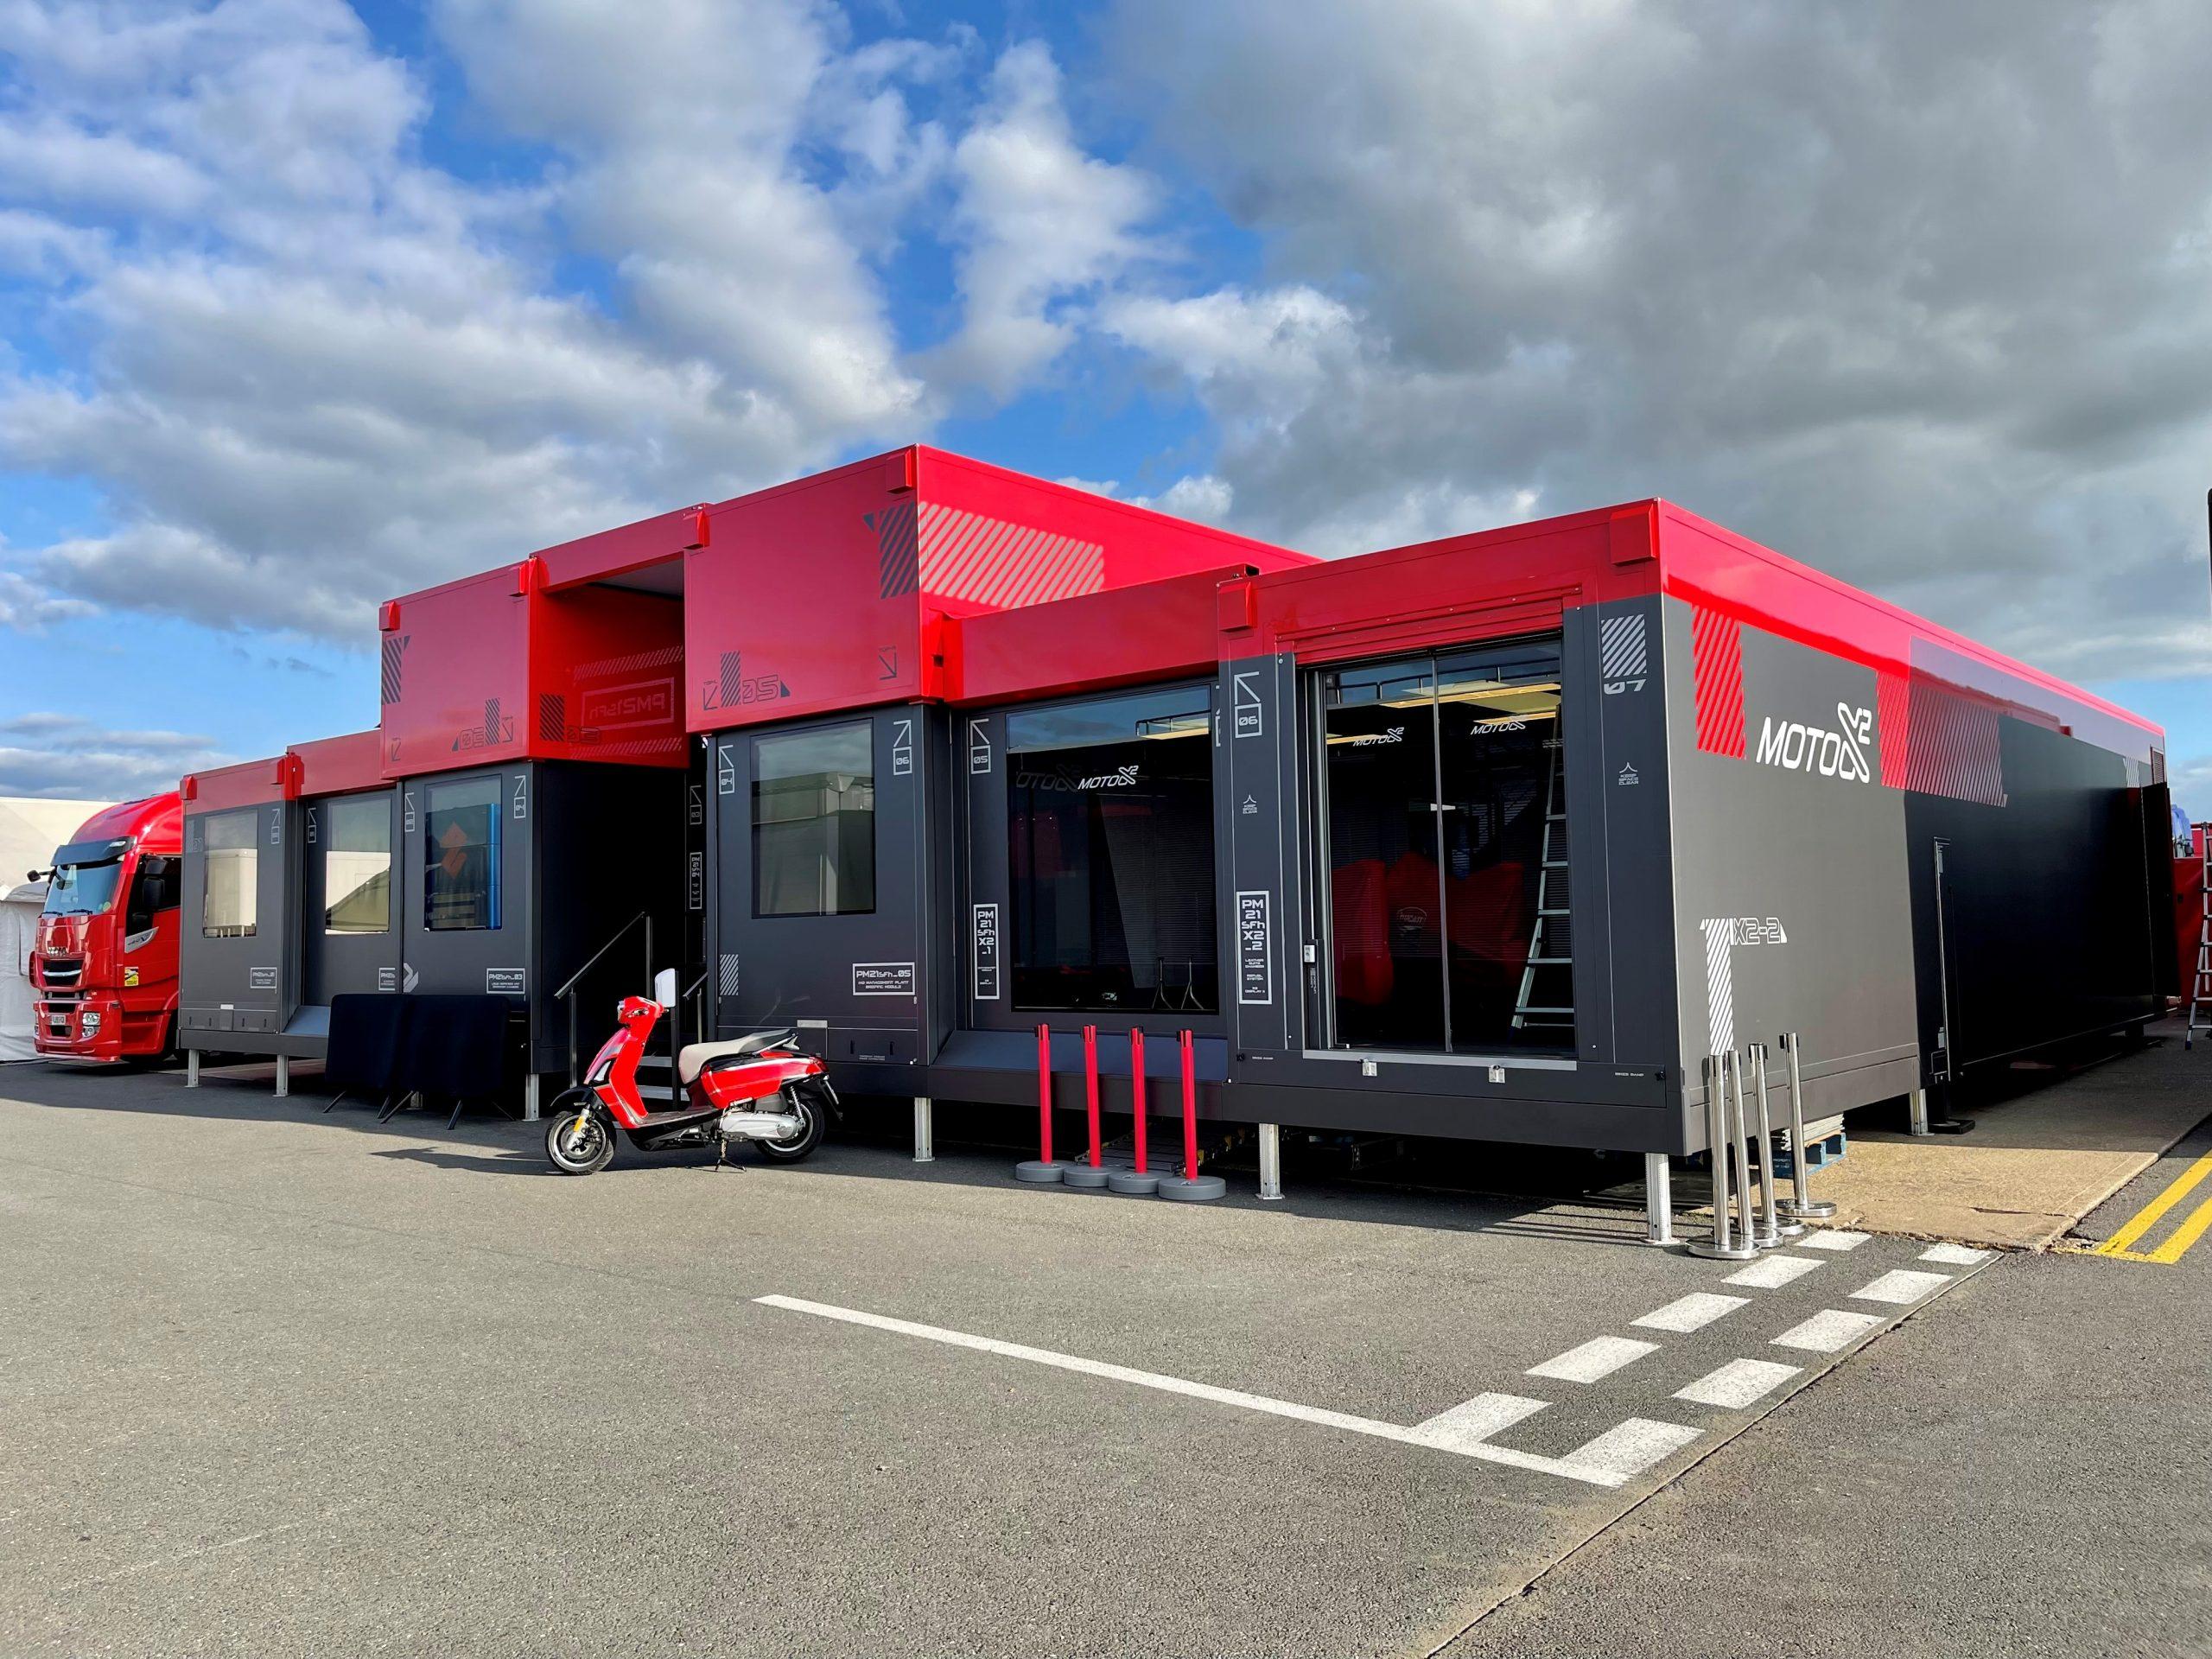 Silverstone motoGP 2021